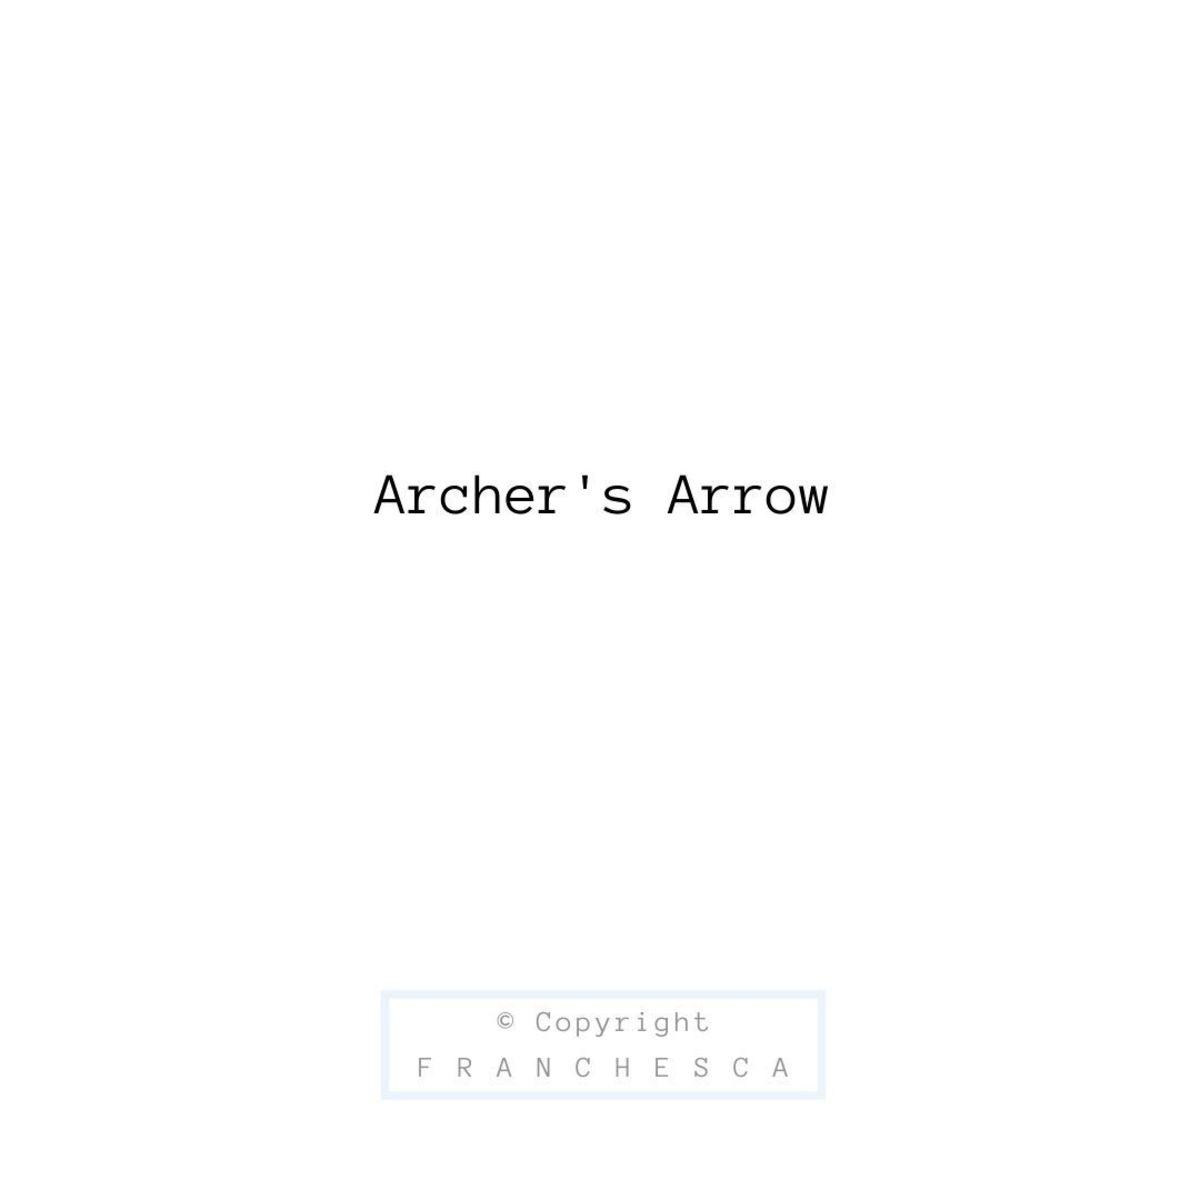 6th Article: Archer's Arrow